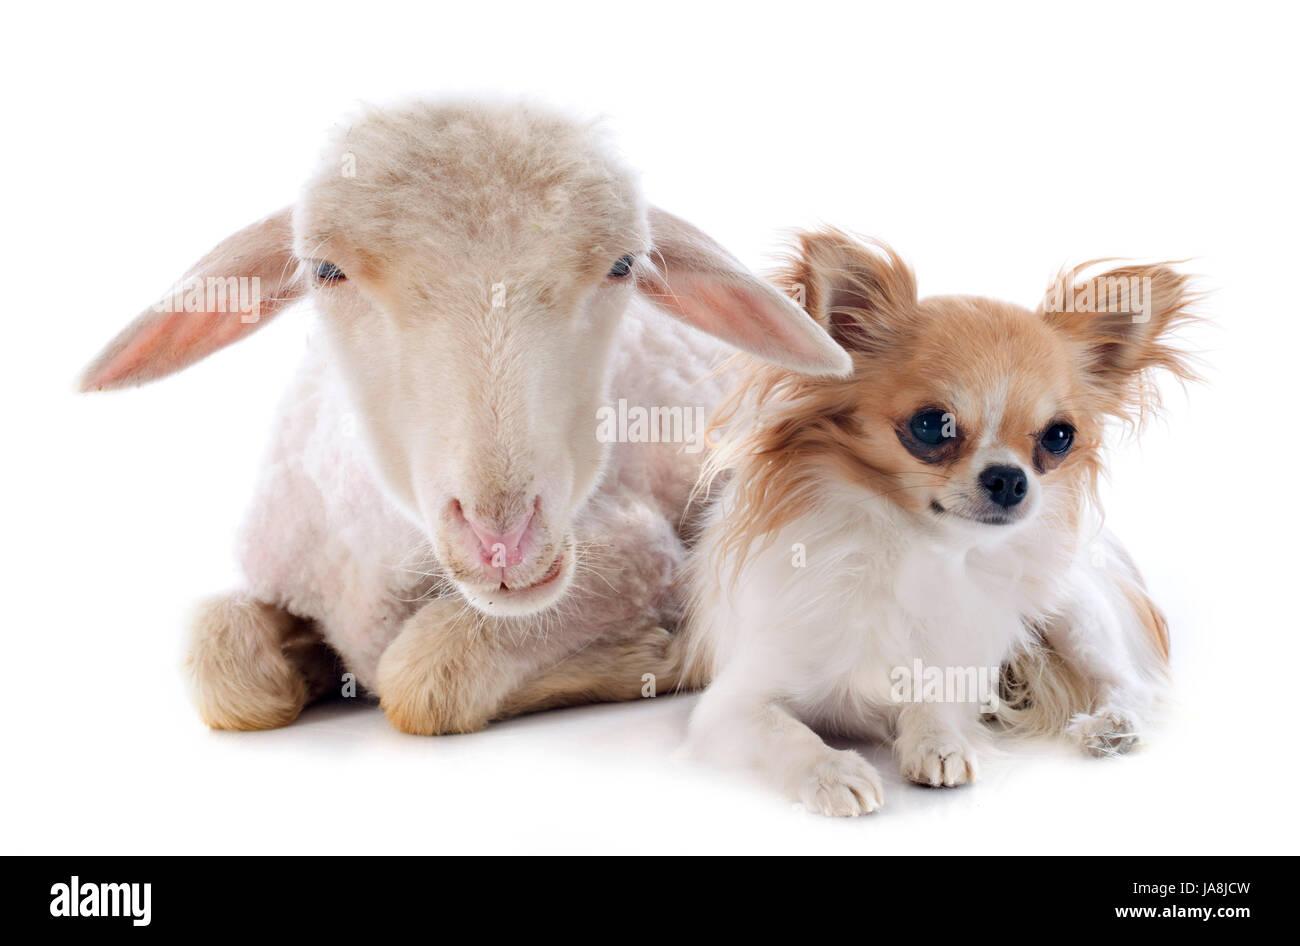 sheep, dog, three, cat baby, kitten, ewe, pussycat, cat, domestic cat, lamb, Stock Photo